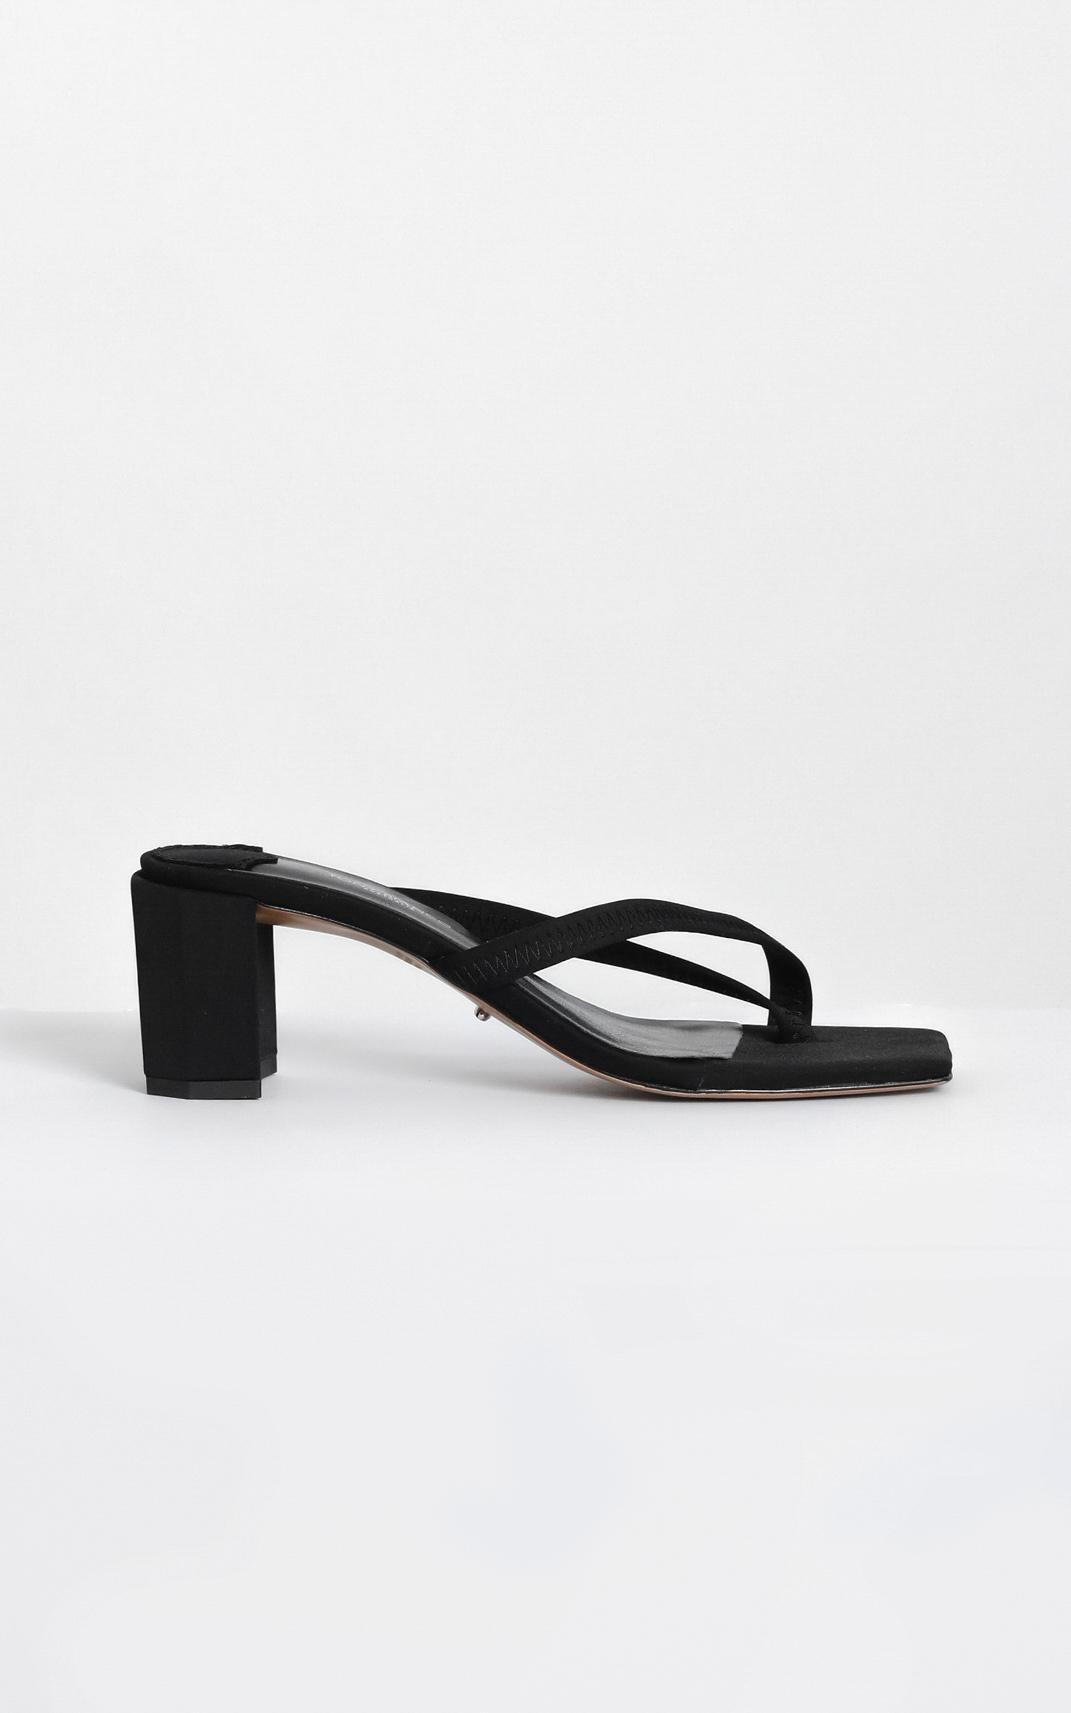 Tony Bianco - Serrah Heels in black lycra - 10, Black, hi-res image number null